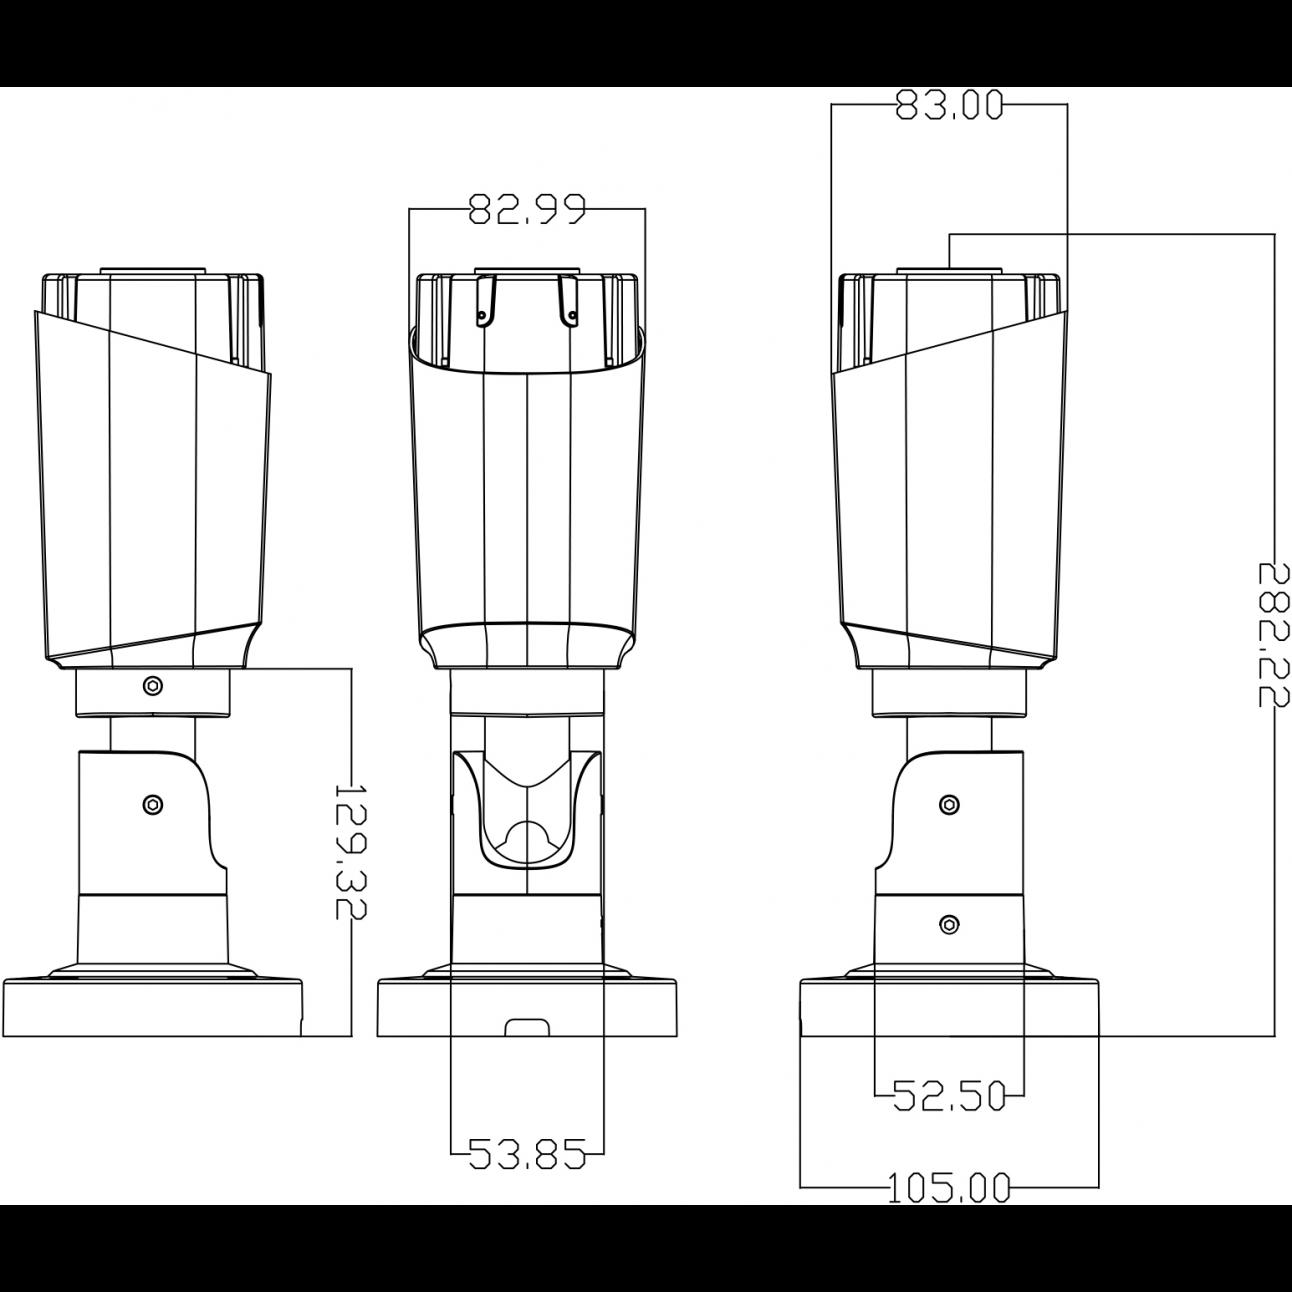 IP камера видеонаблюдения OMNY серия  BASE ViBe2 Starlight уличная 2Мп, мотор. объектив 2.8-12мм, 12В/PoE, ИК до 50м, EasyMic